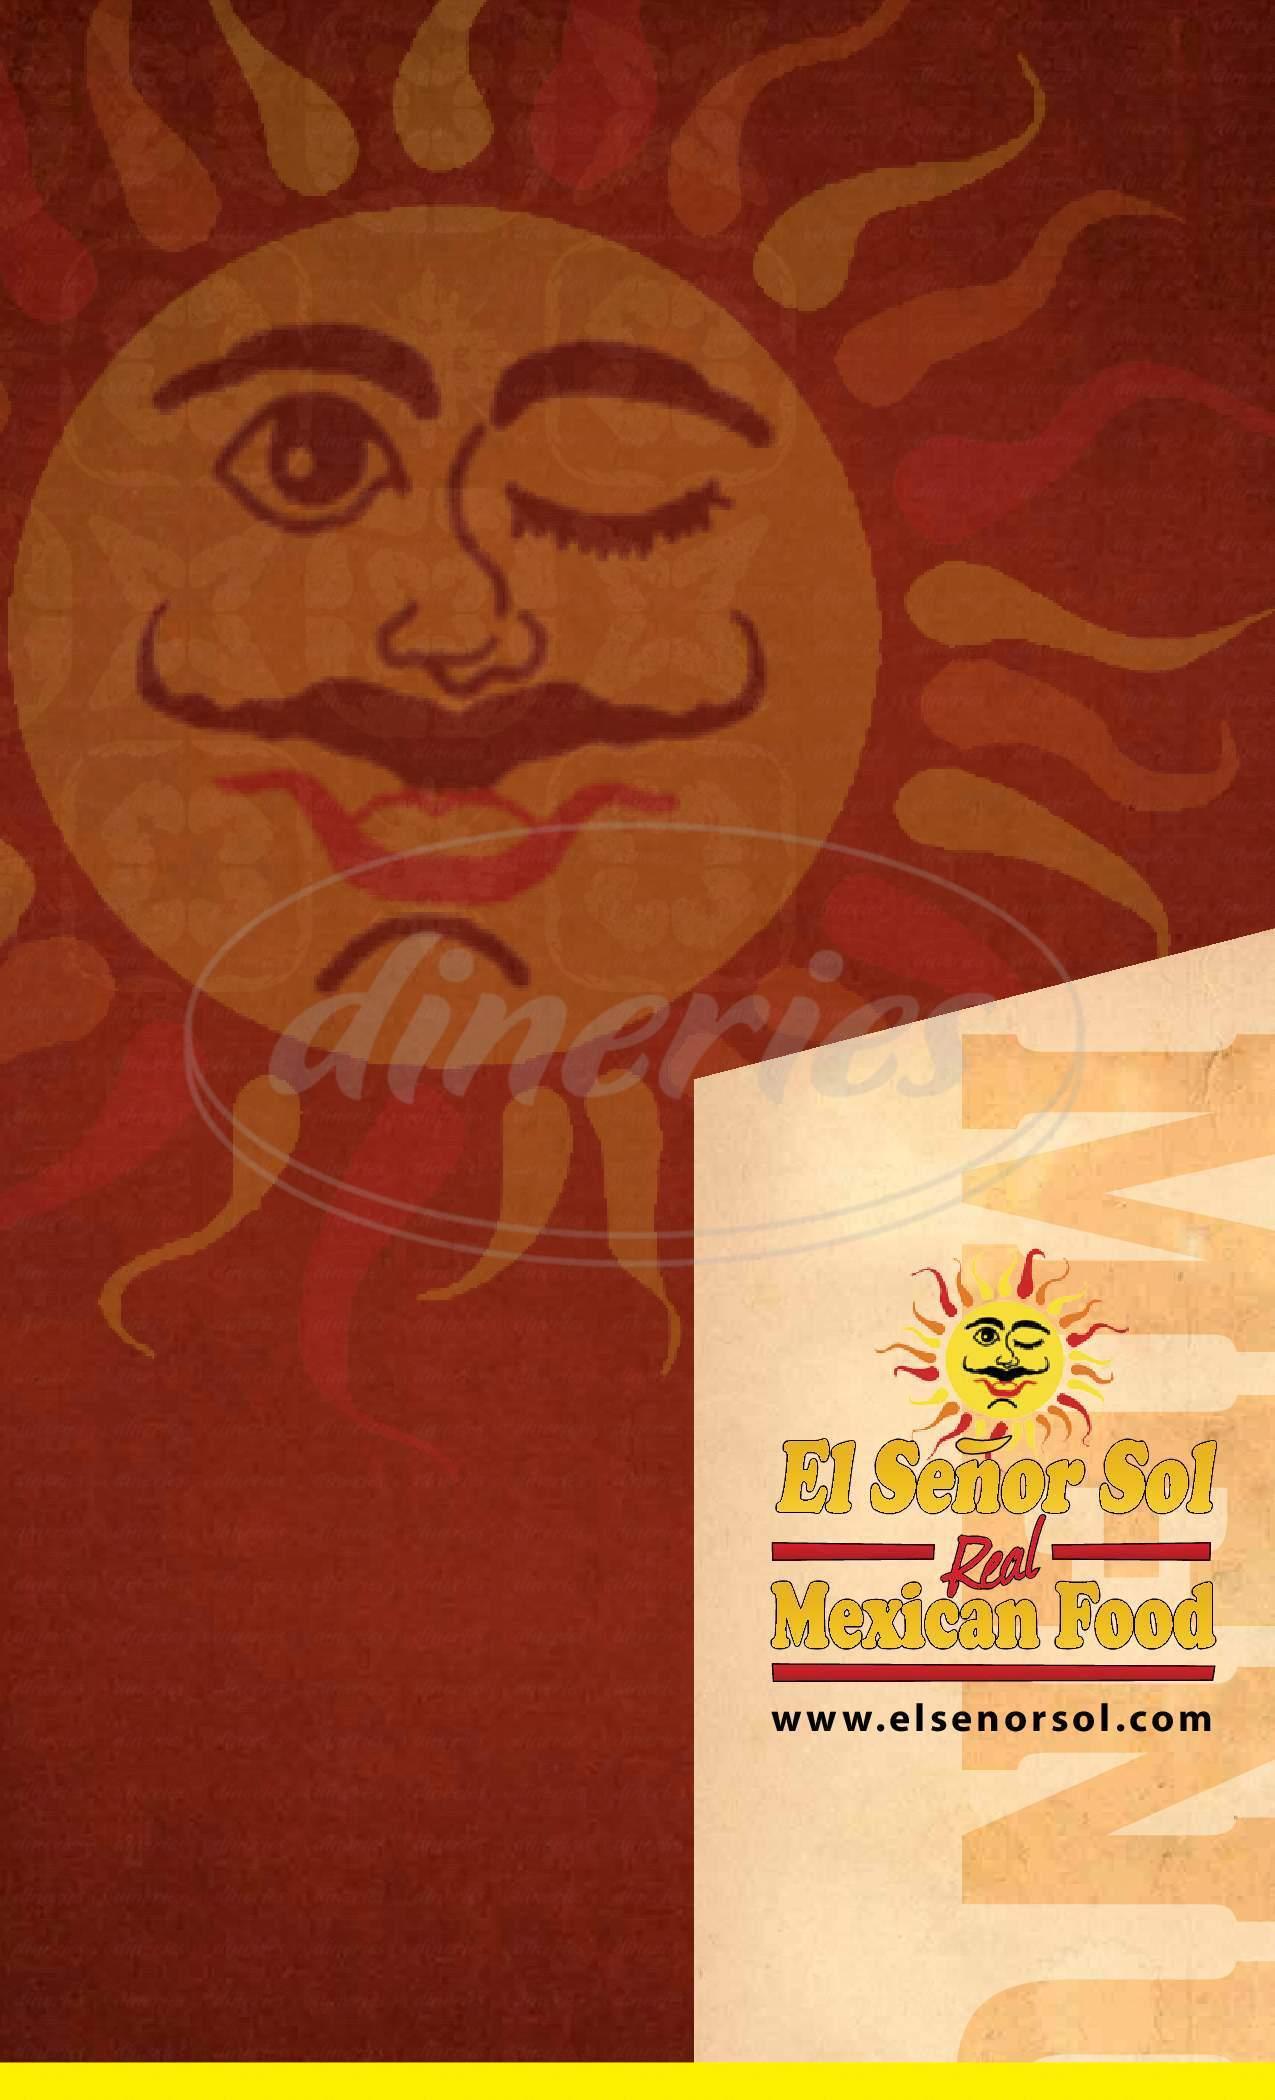 menu for El Señor Sol